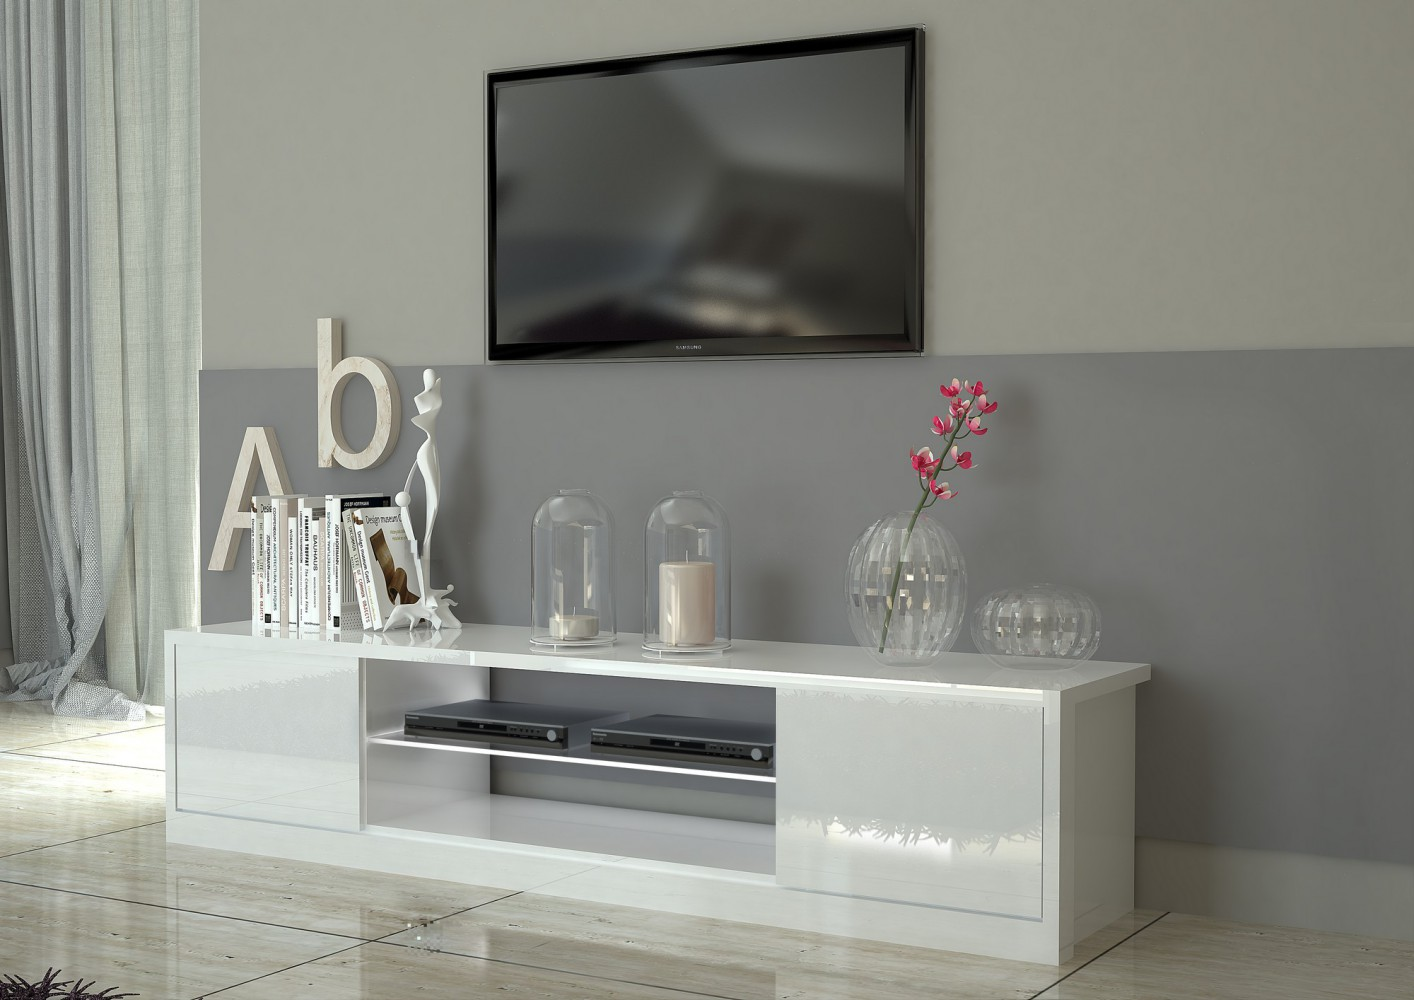 Tecnos MITO Lowboard, 180cm Wohnwand Mediawand Italian Design modern ...